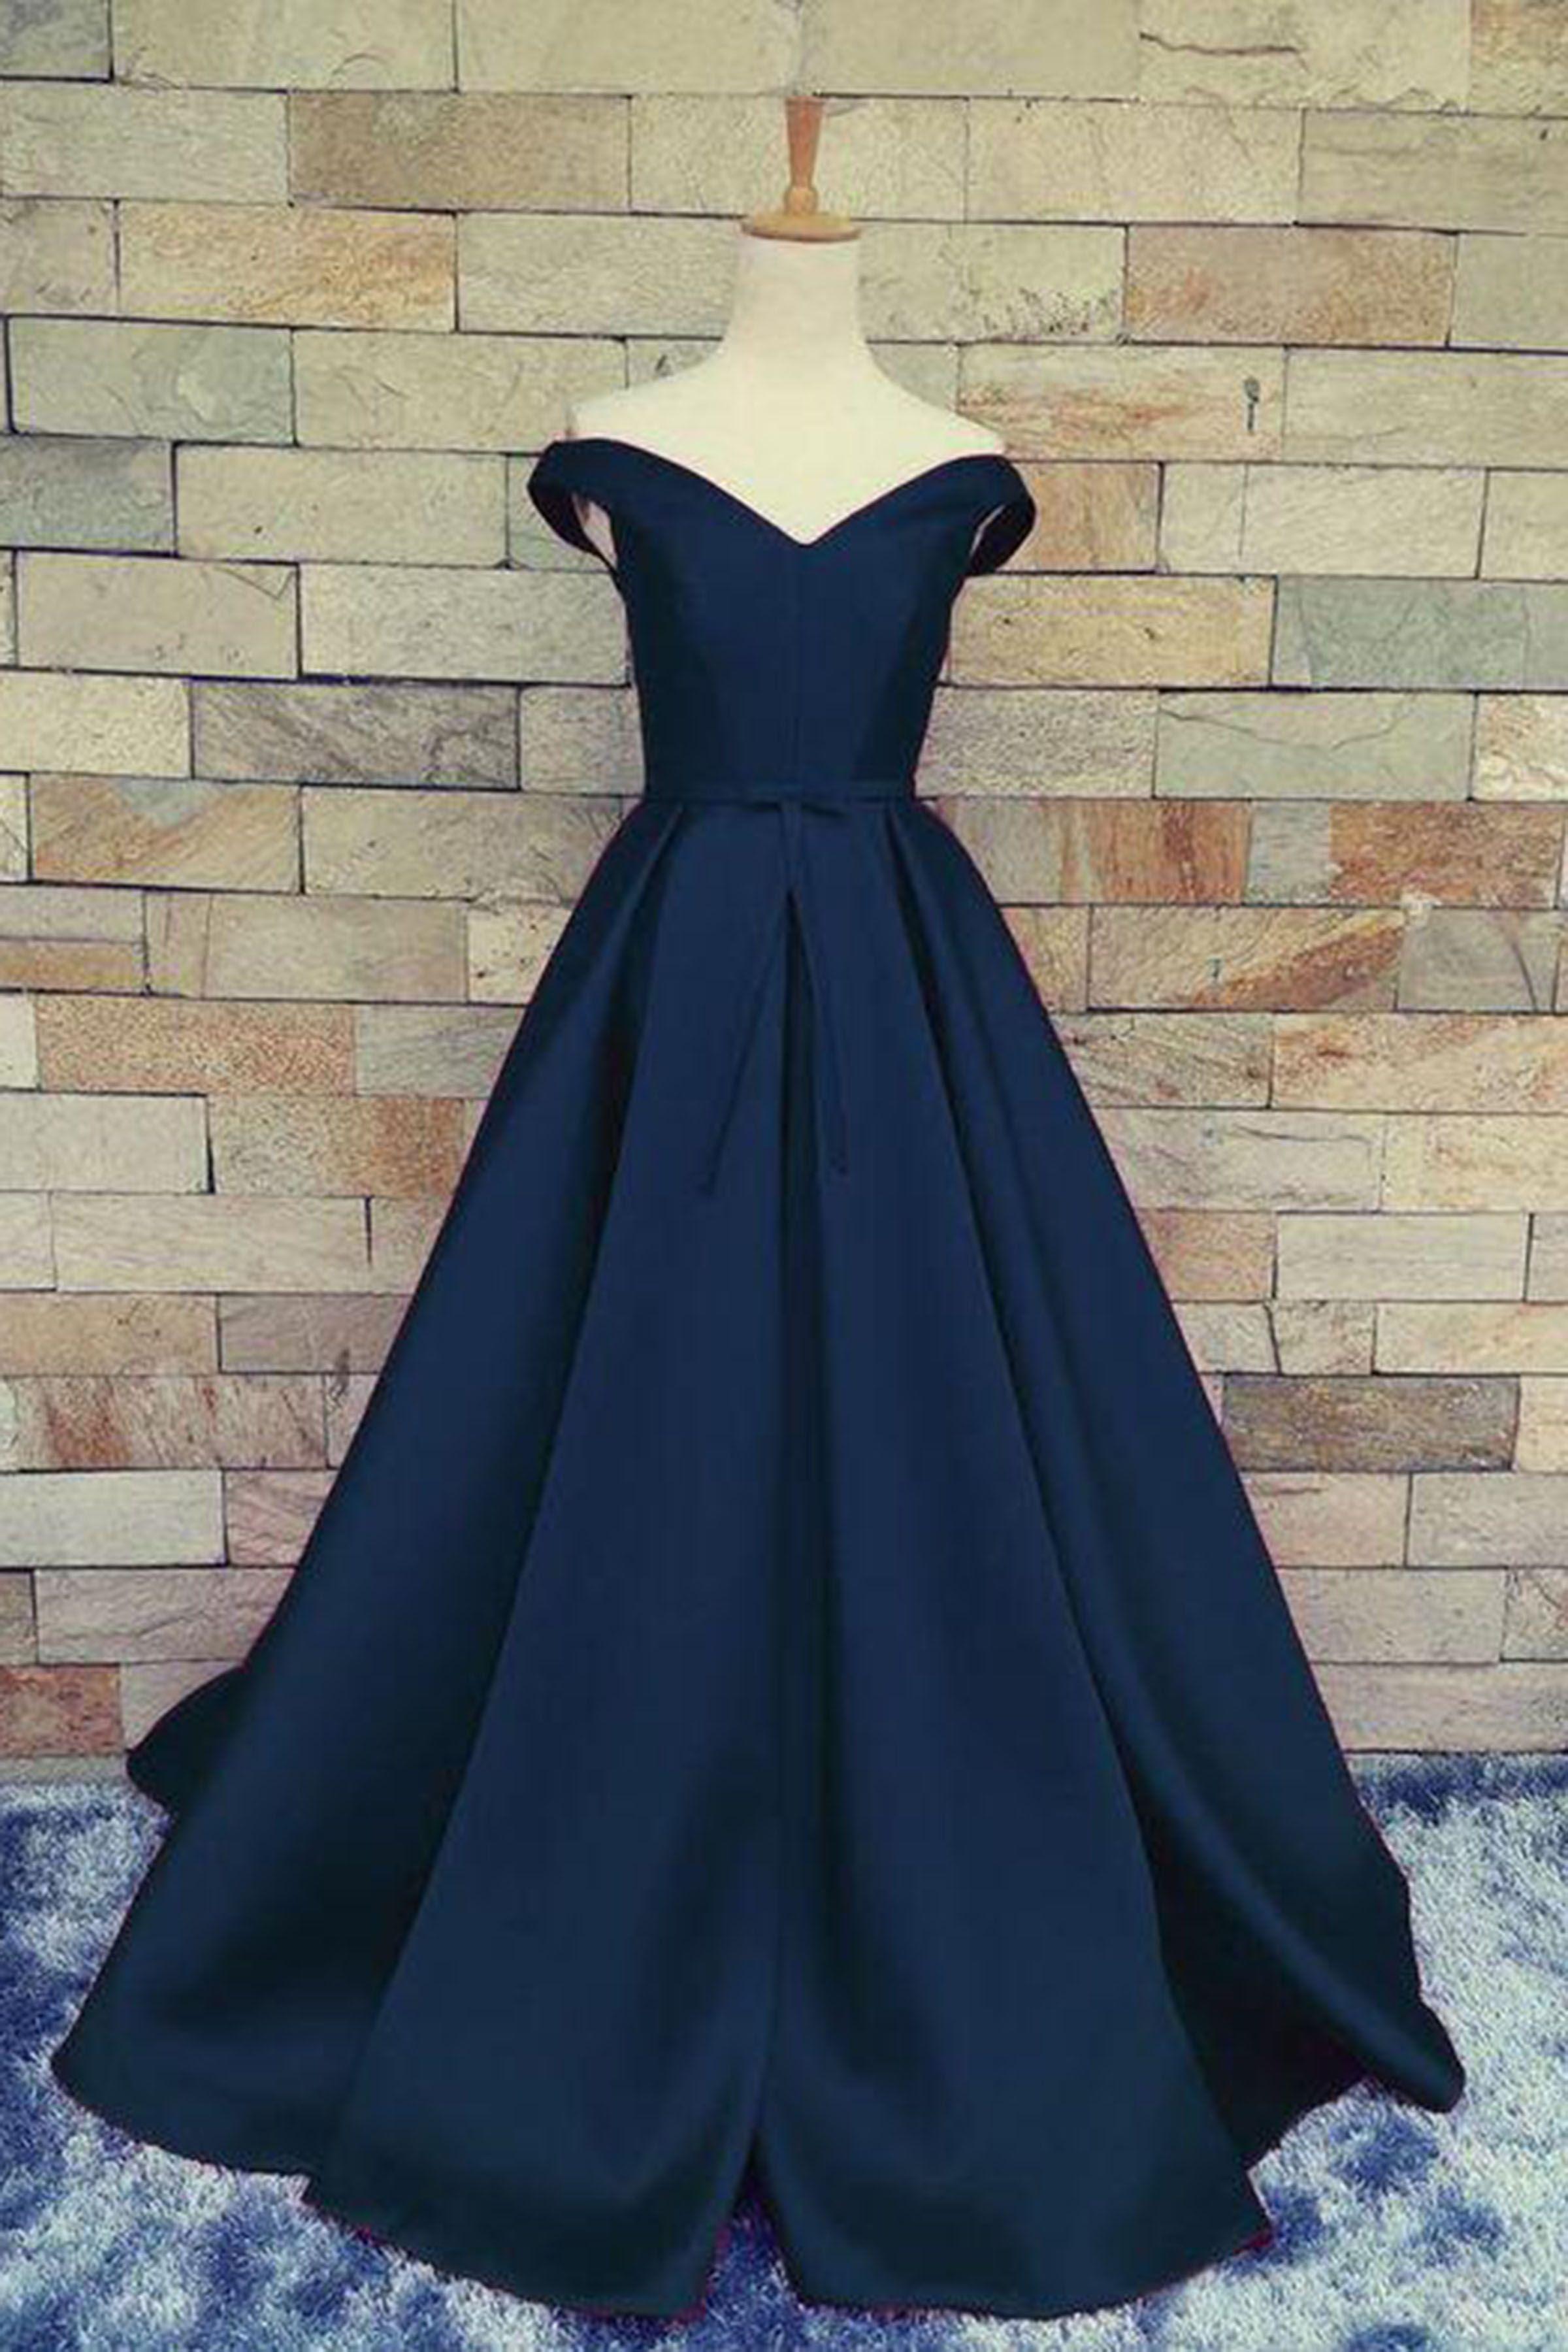 Offshoulder prom dresschiffon prom dress ball gown elegant dark